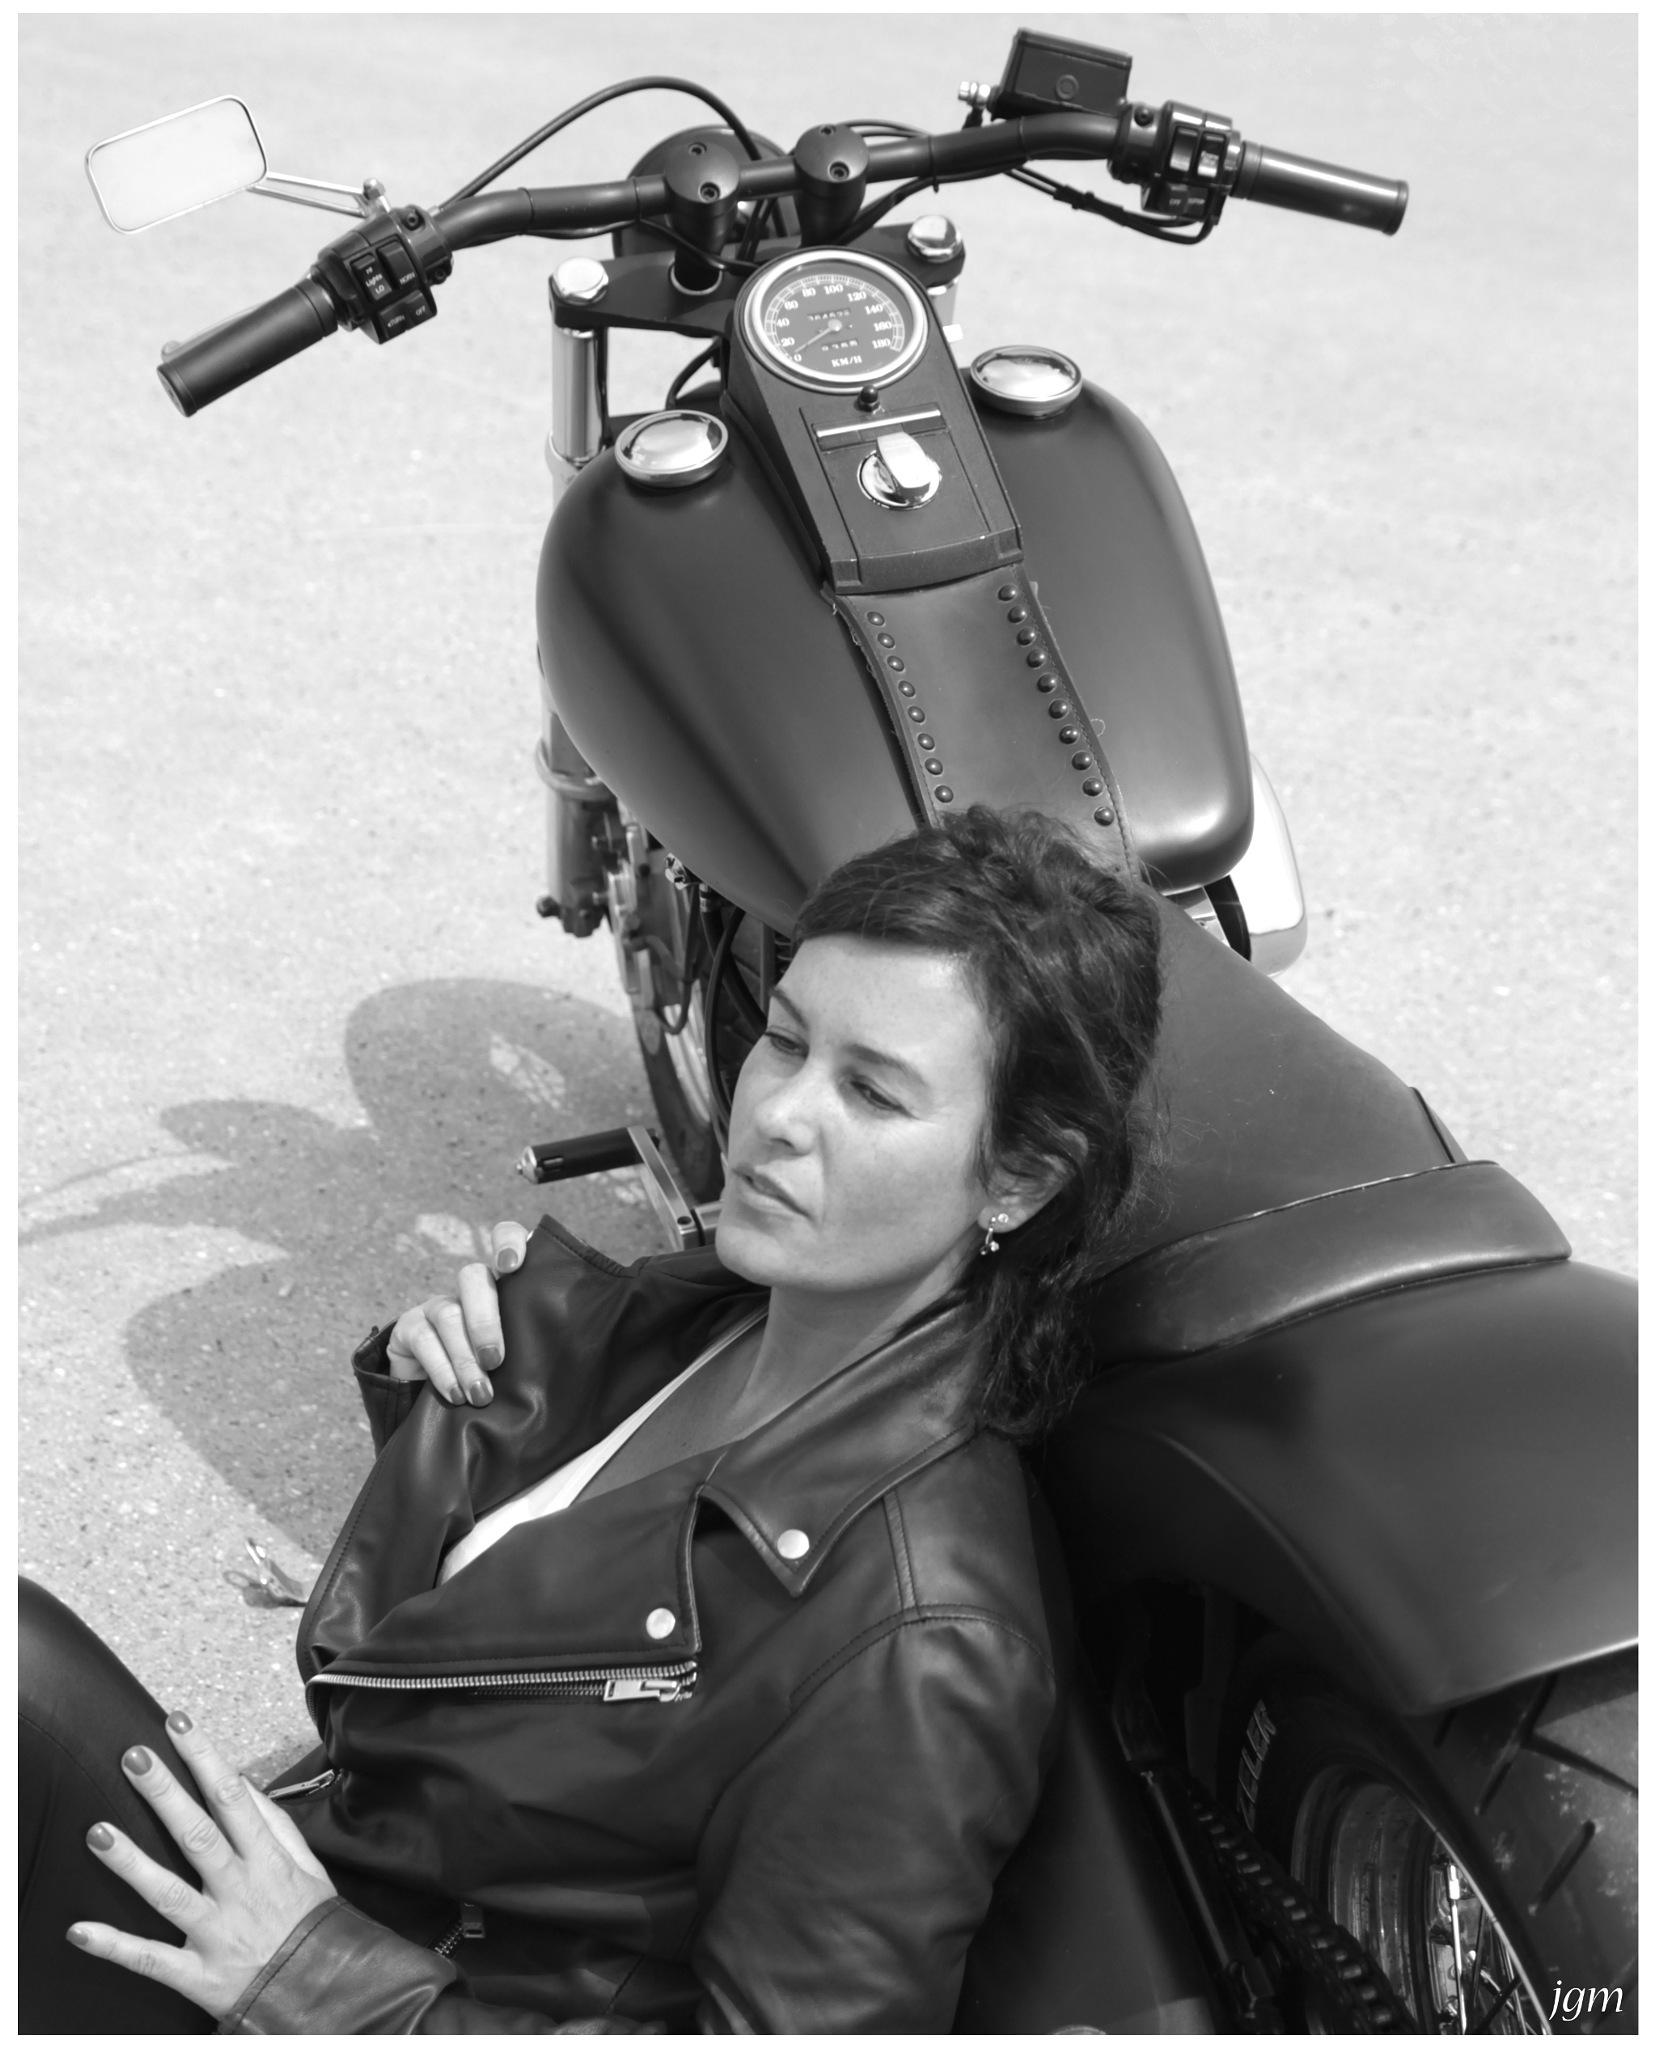 Harley girl by Jan Machielsen